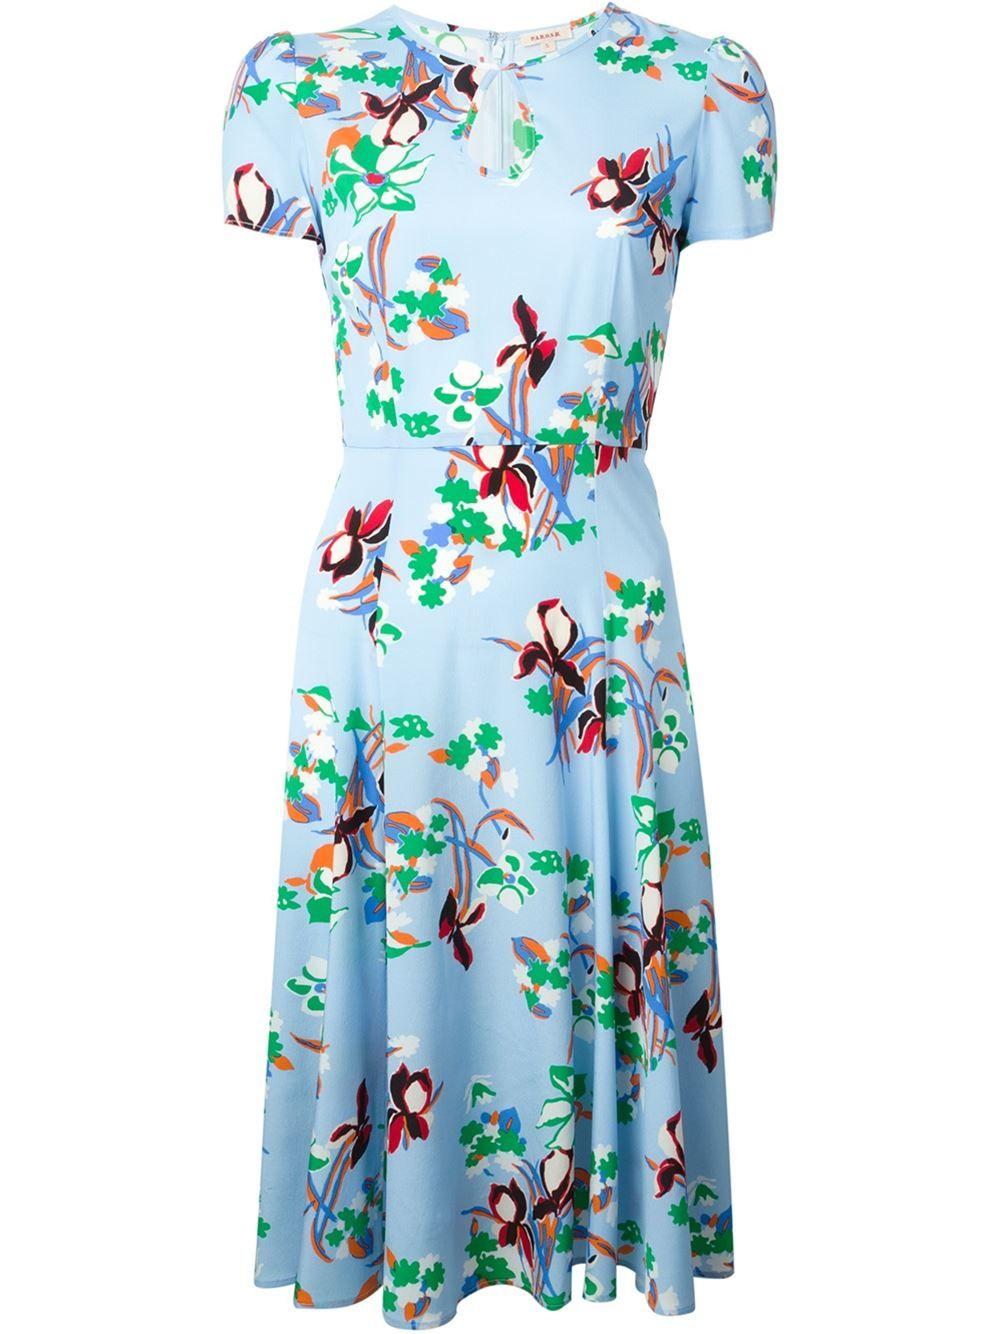 P.a.r.o.s.h. 'sealy' Flower Print Dress - Biffi - Farfetch.com